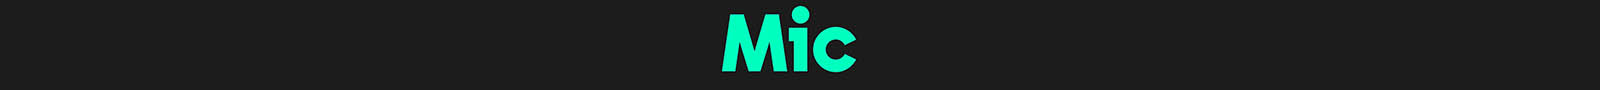 mic masthead 2.jpg